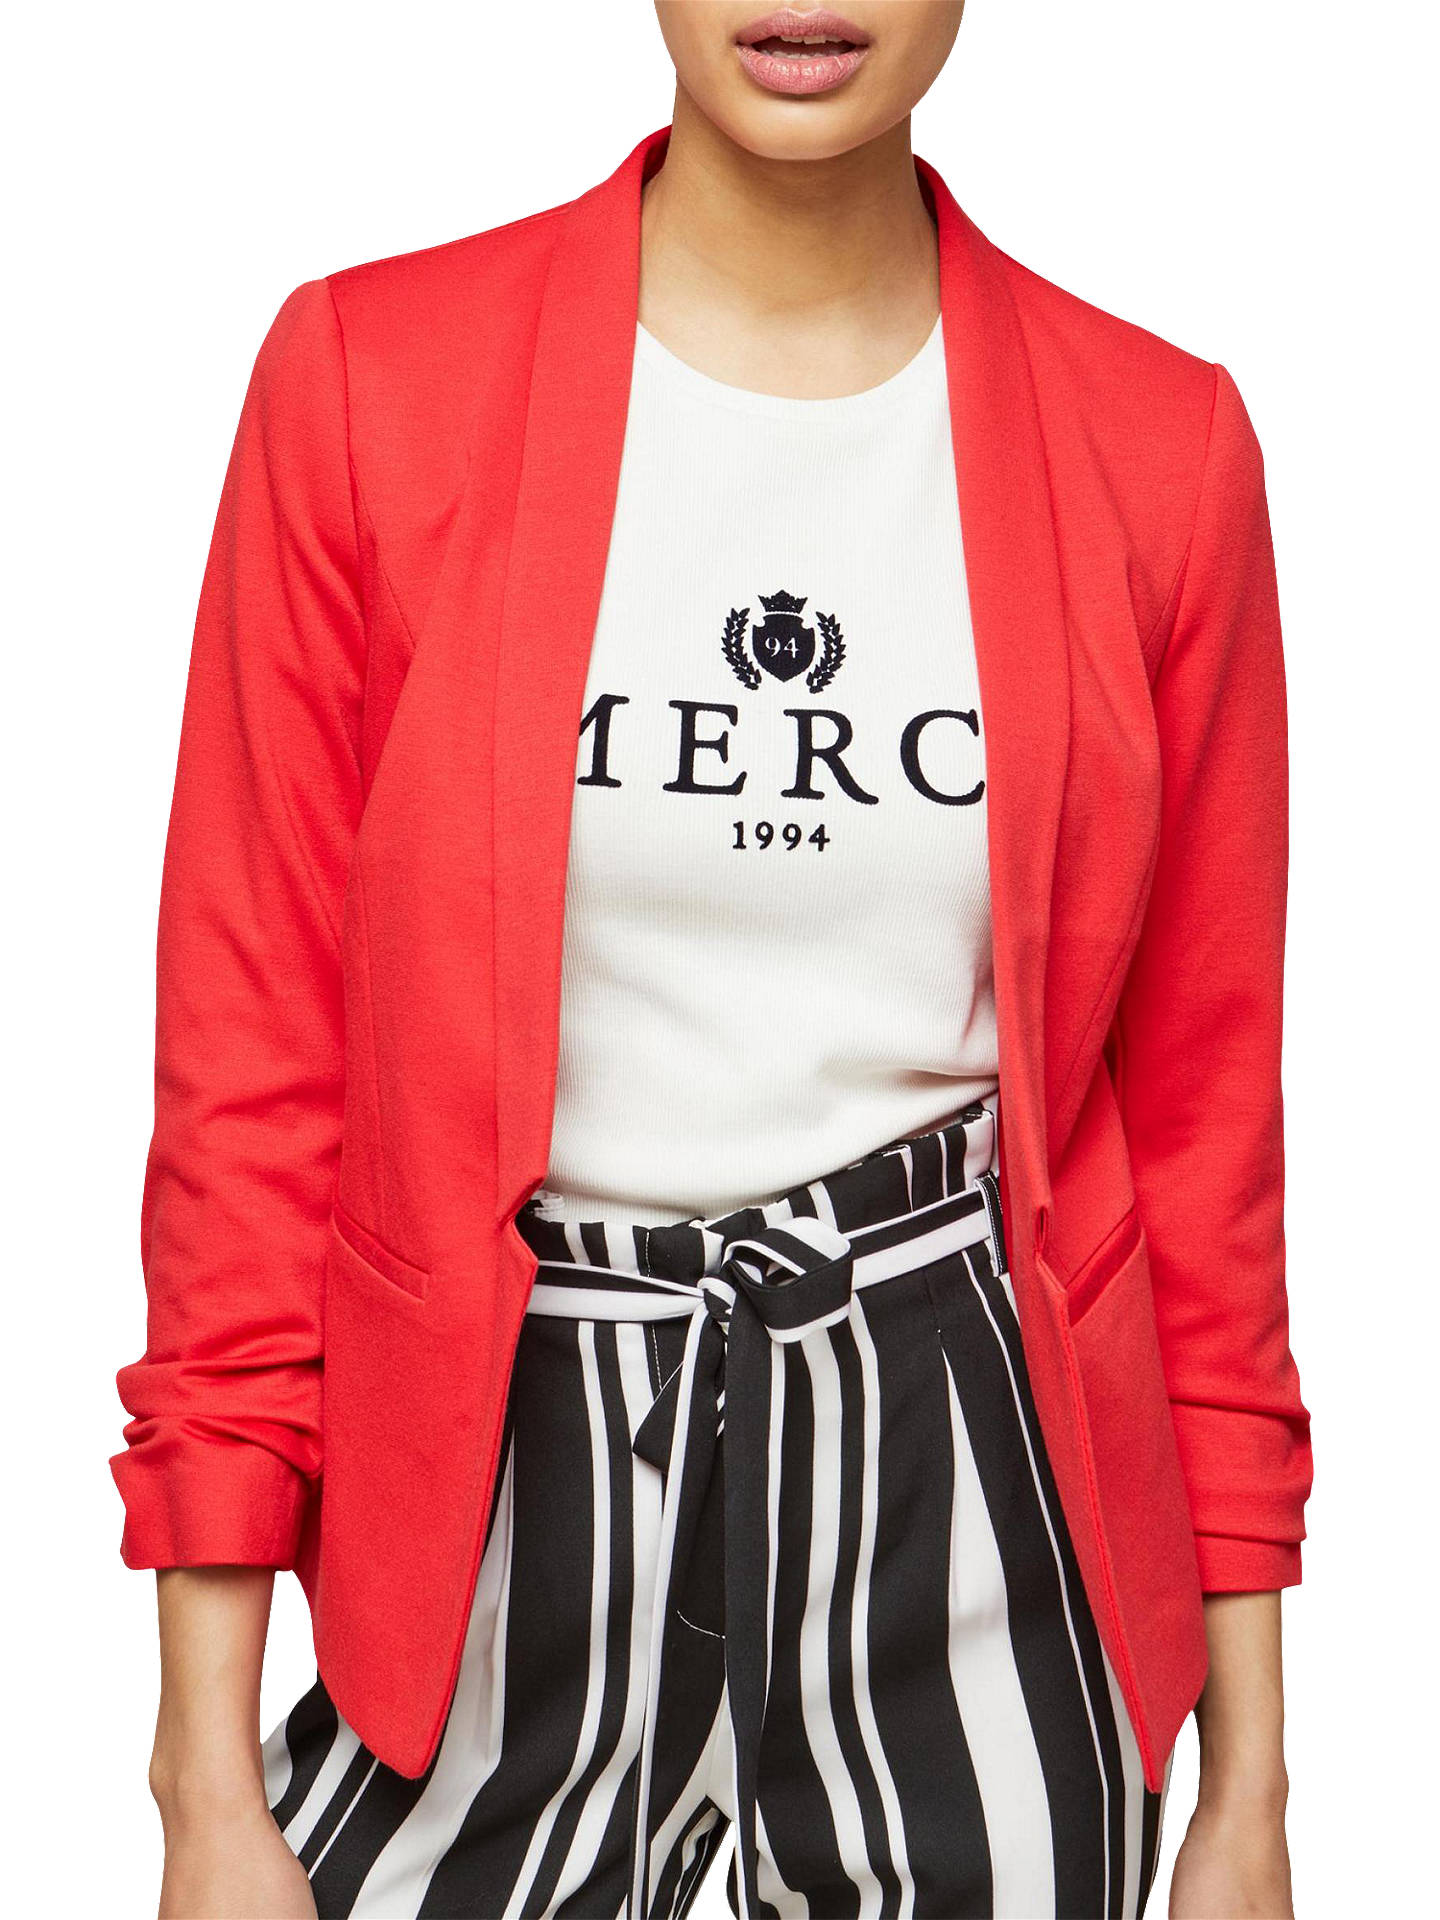 ce5ad92f23751 Buy Miss Selfridge Petite Ruched Sleeve Ponte Jacket, Red, 6 Online at  johnlewis.